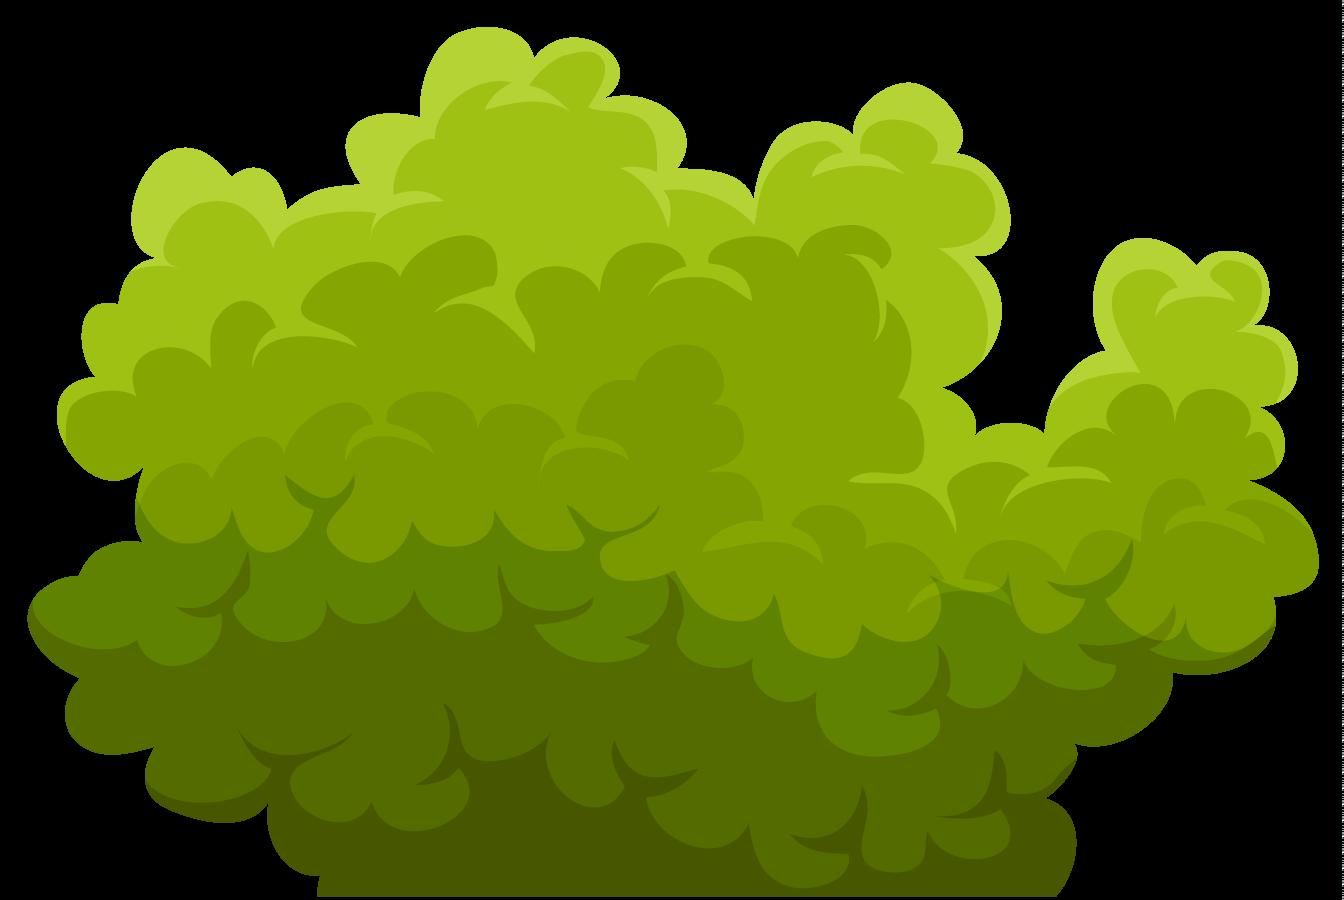 Free Cartoon Bush Png, Download Free Clip Art, Free Clip Art.